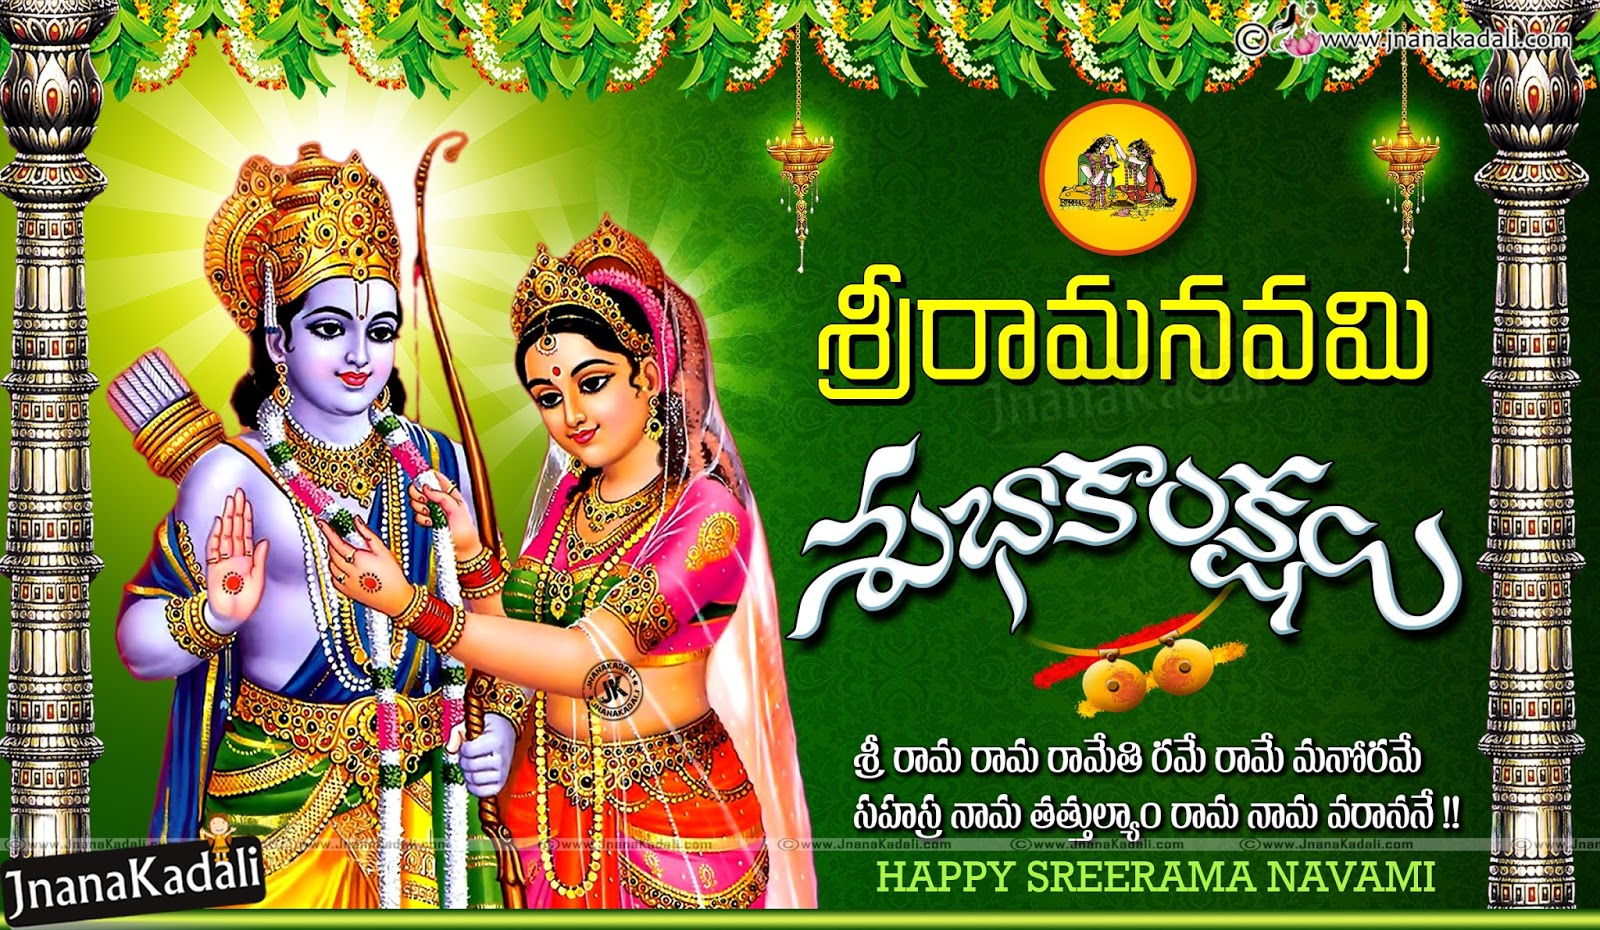 Sri ramanavam 2017 greetings with lord rama and seetha hd wallpapers sru ramanavam greetings in telugu telugu festival sri rama navami greetings free download m4hsunfo